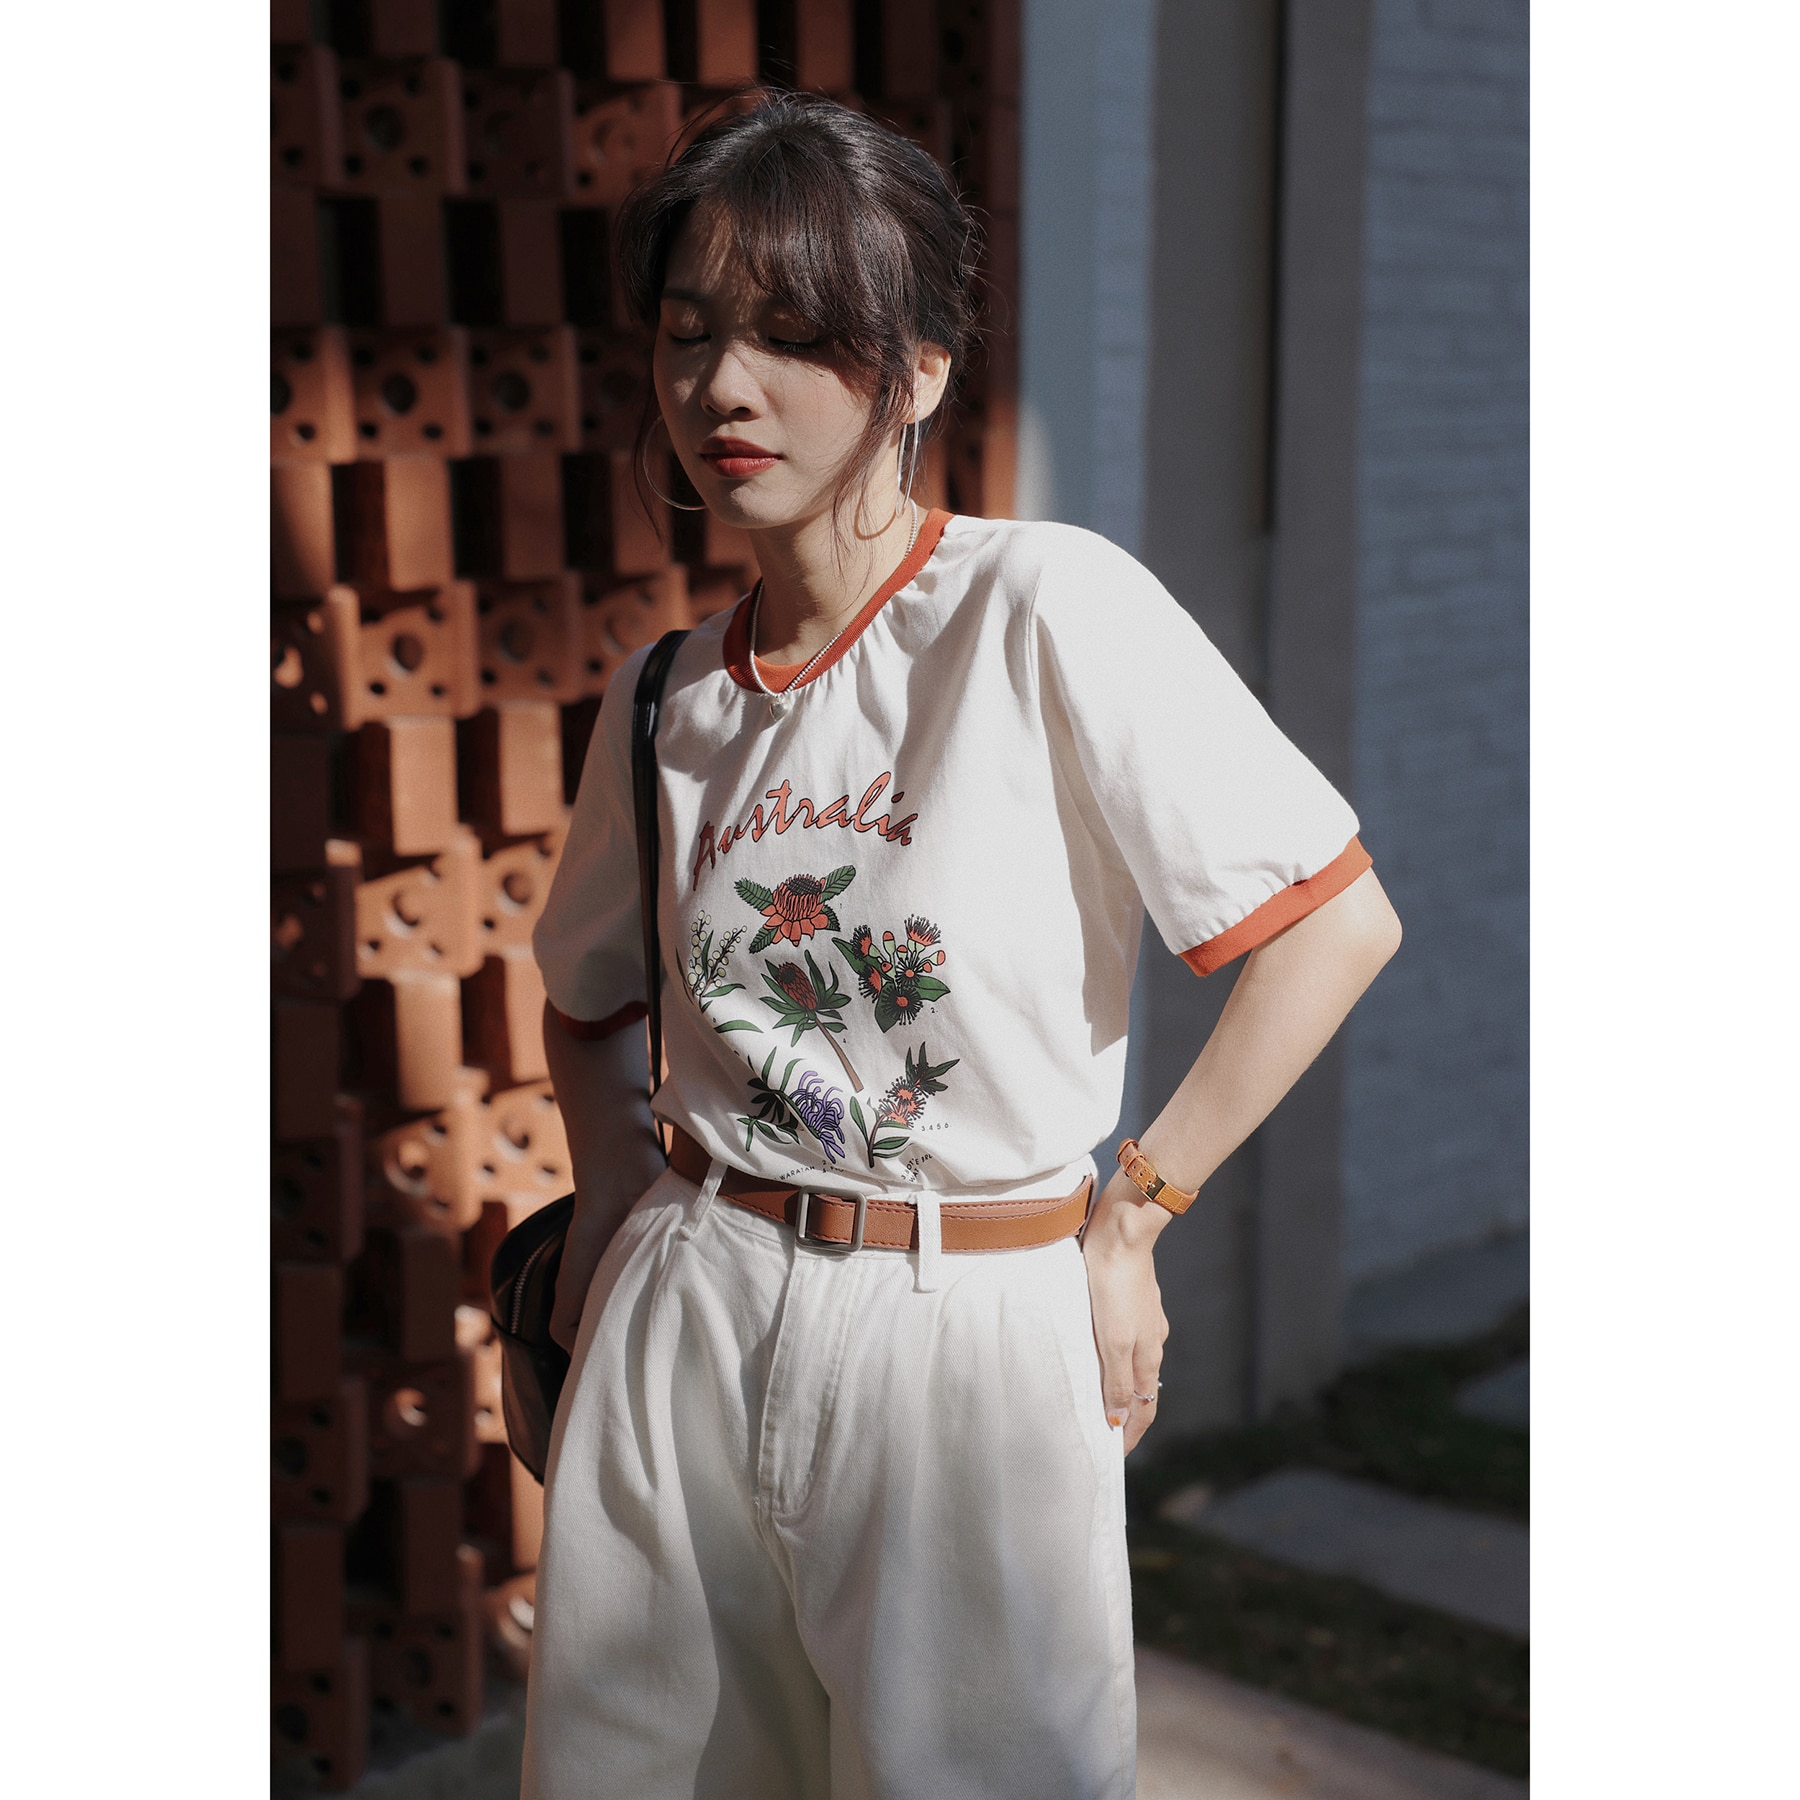 OYANXI الجولة الرقبة التباين اللون تصميم قصيرة الأكمام تي شيرت المرأة الصيف جديد ريترو رسالة الطباعة رداء علوي غير رسمي